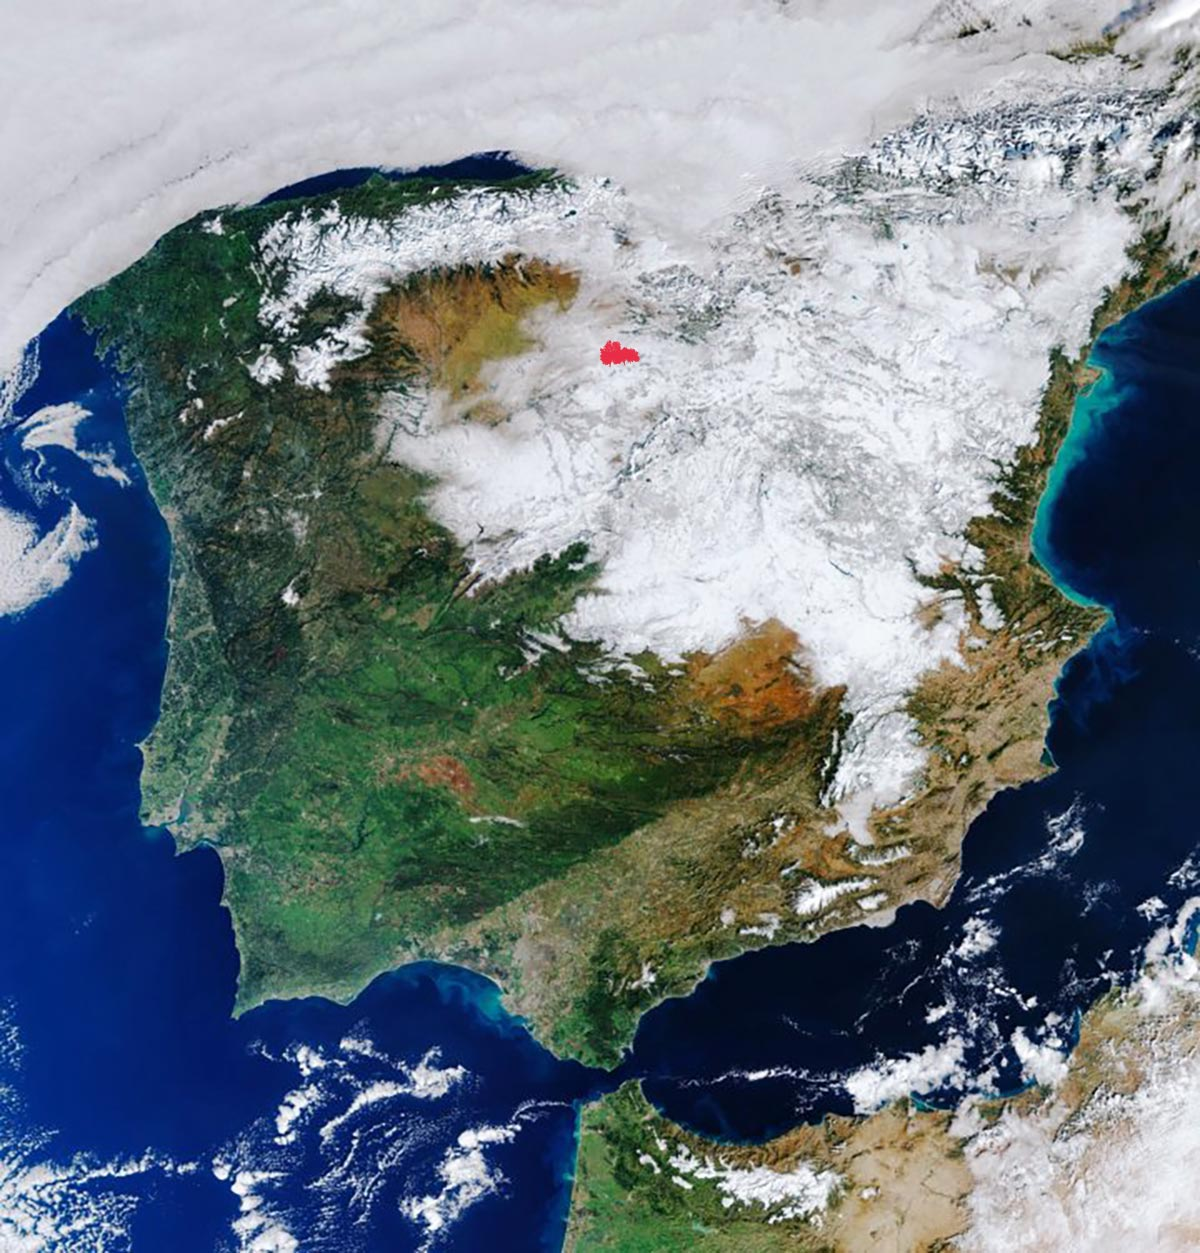 tormenta-filomena-nieve-tempete-neige-12-enero-2021-espana-espagne